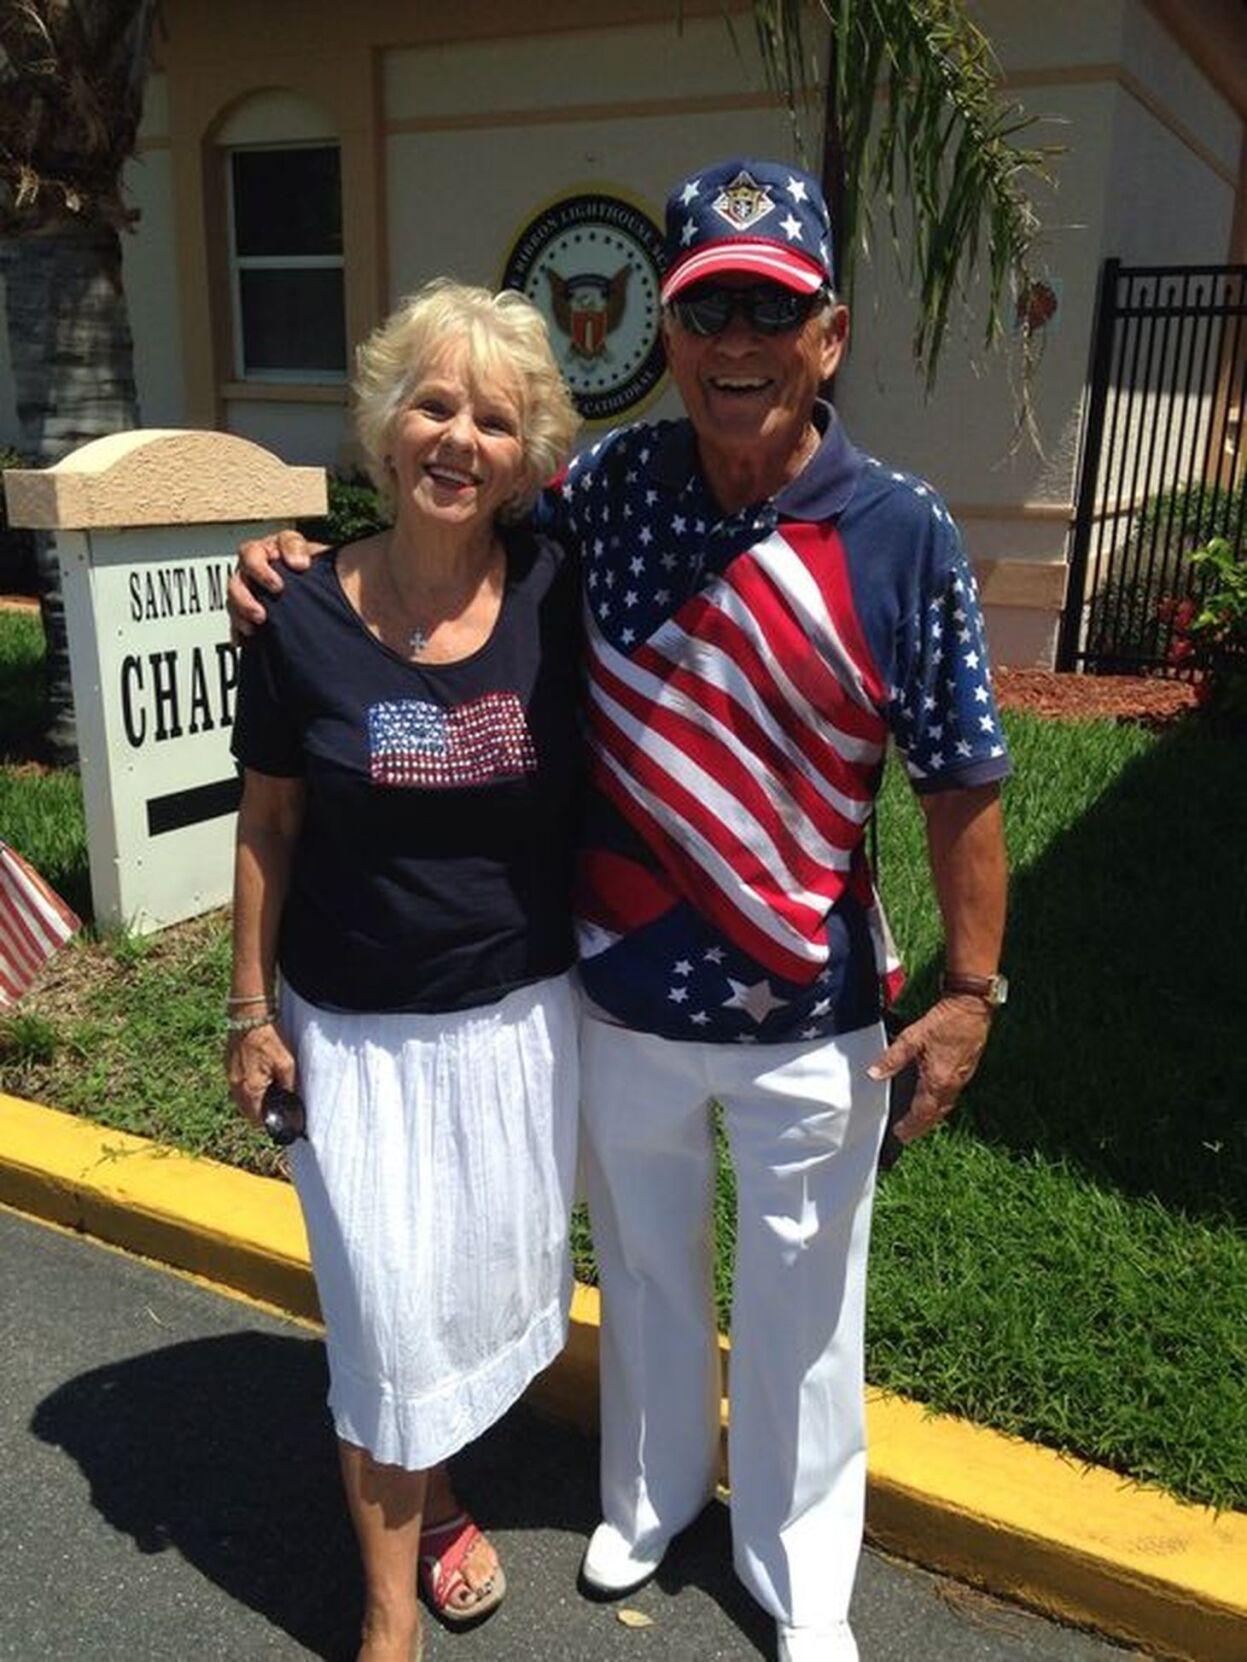 Mr and Mrs. America